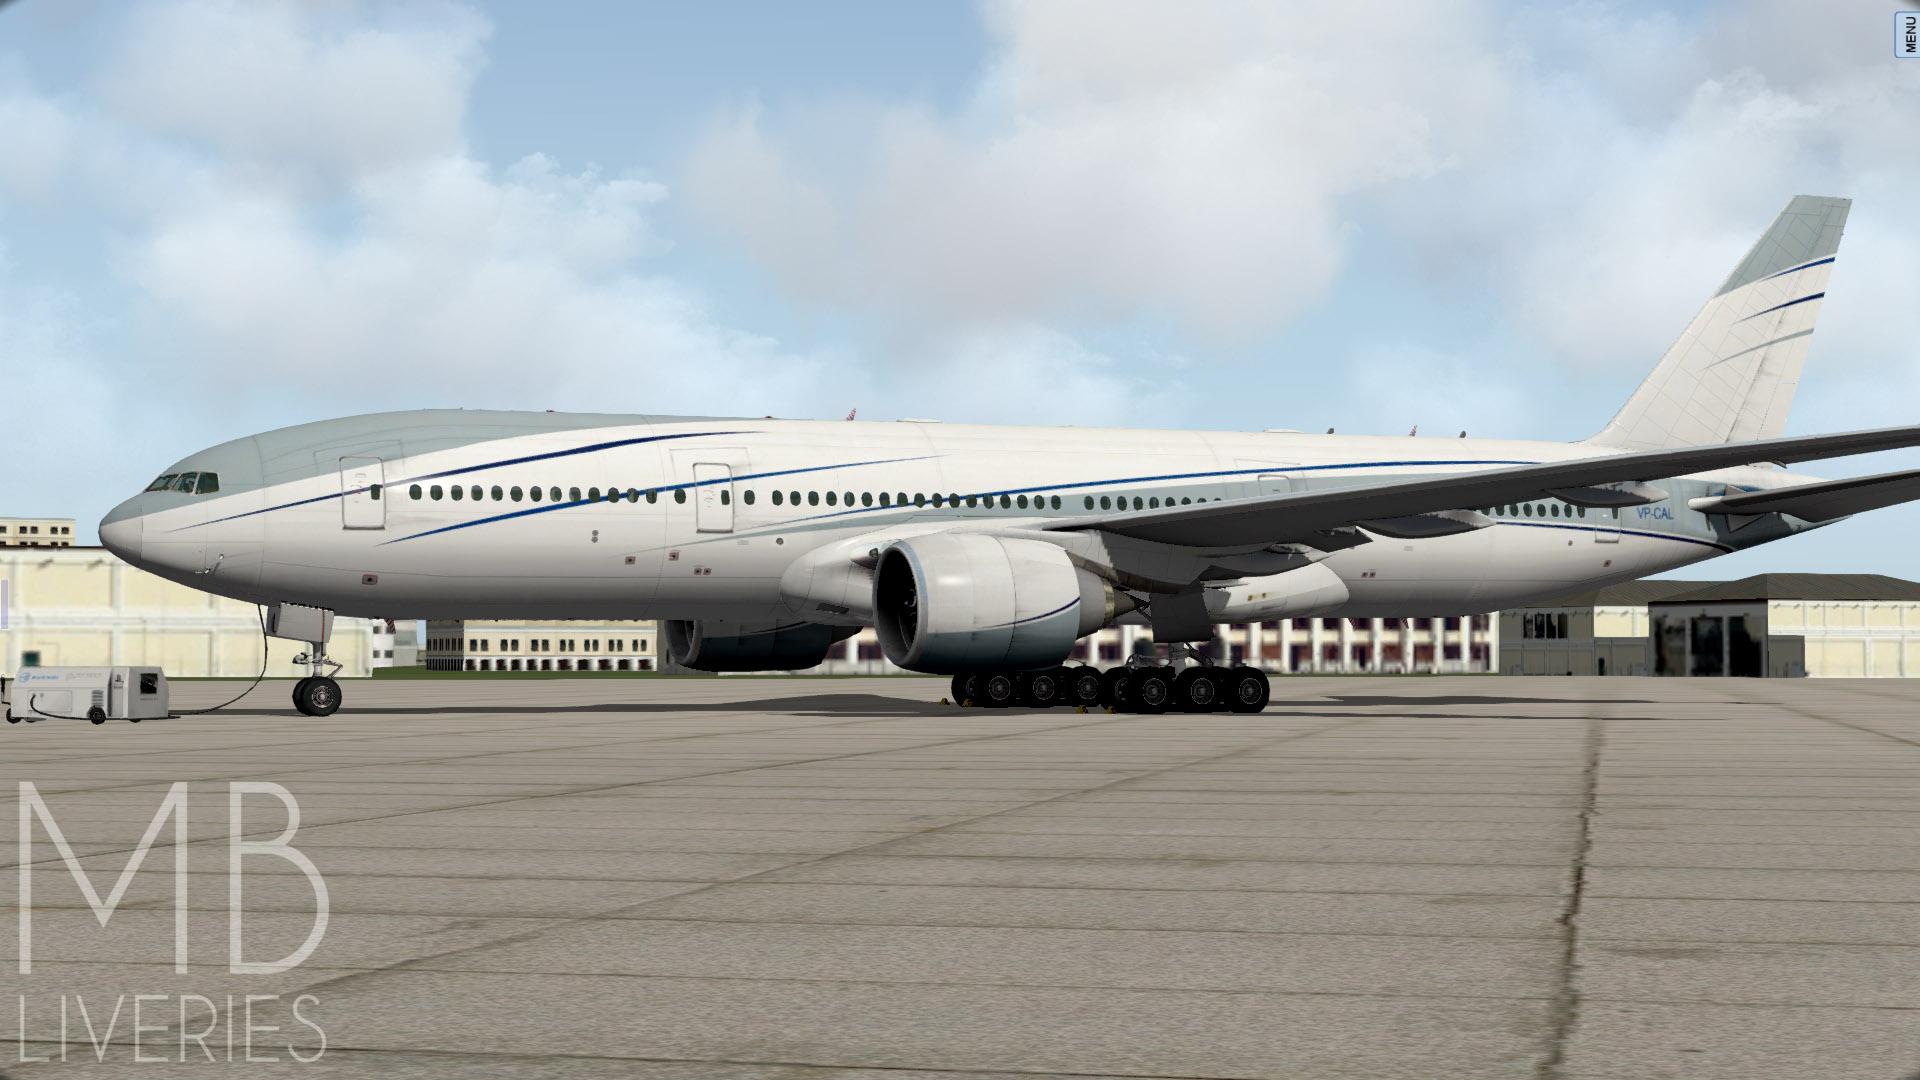 B777 worldliner professional | aerosoft shop.